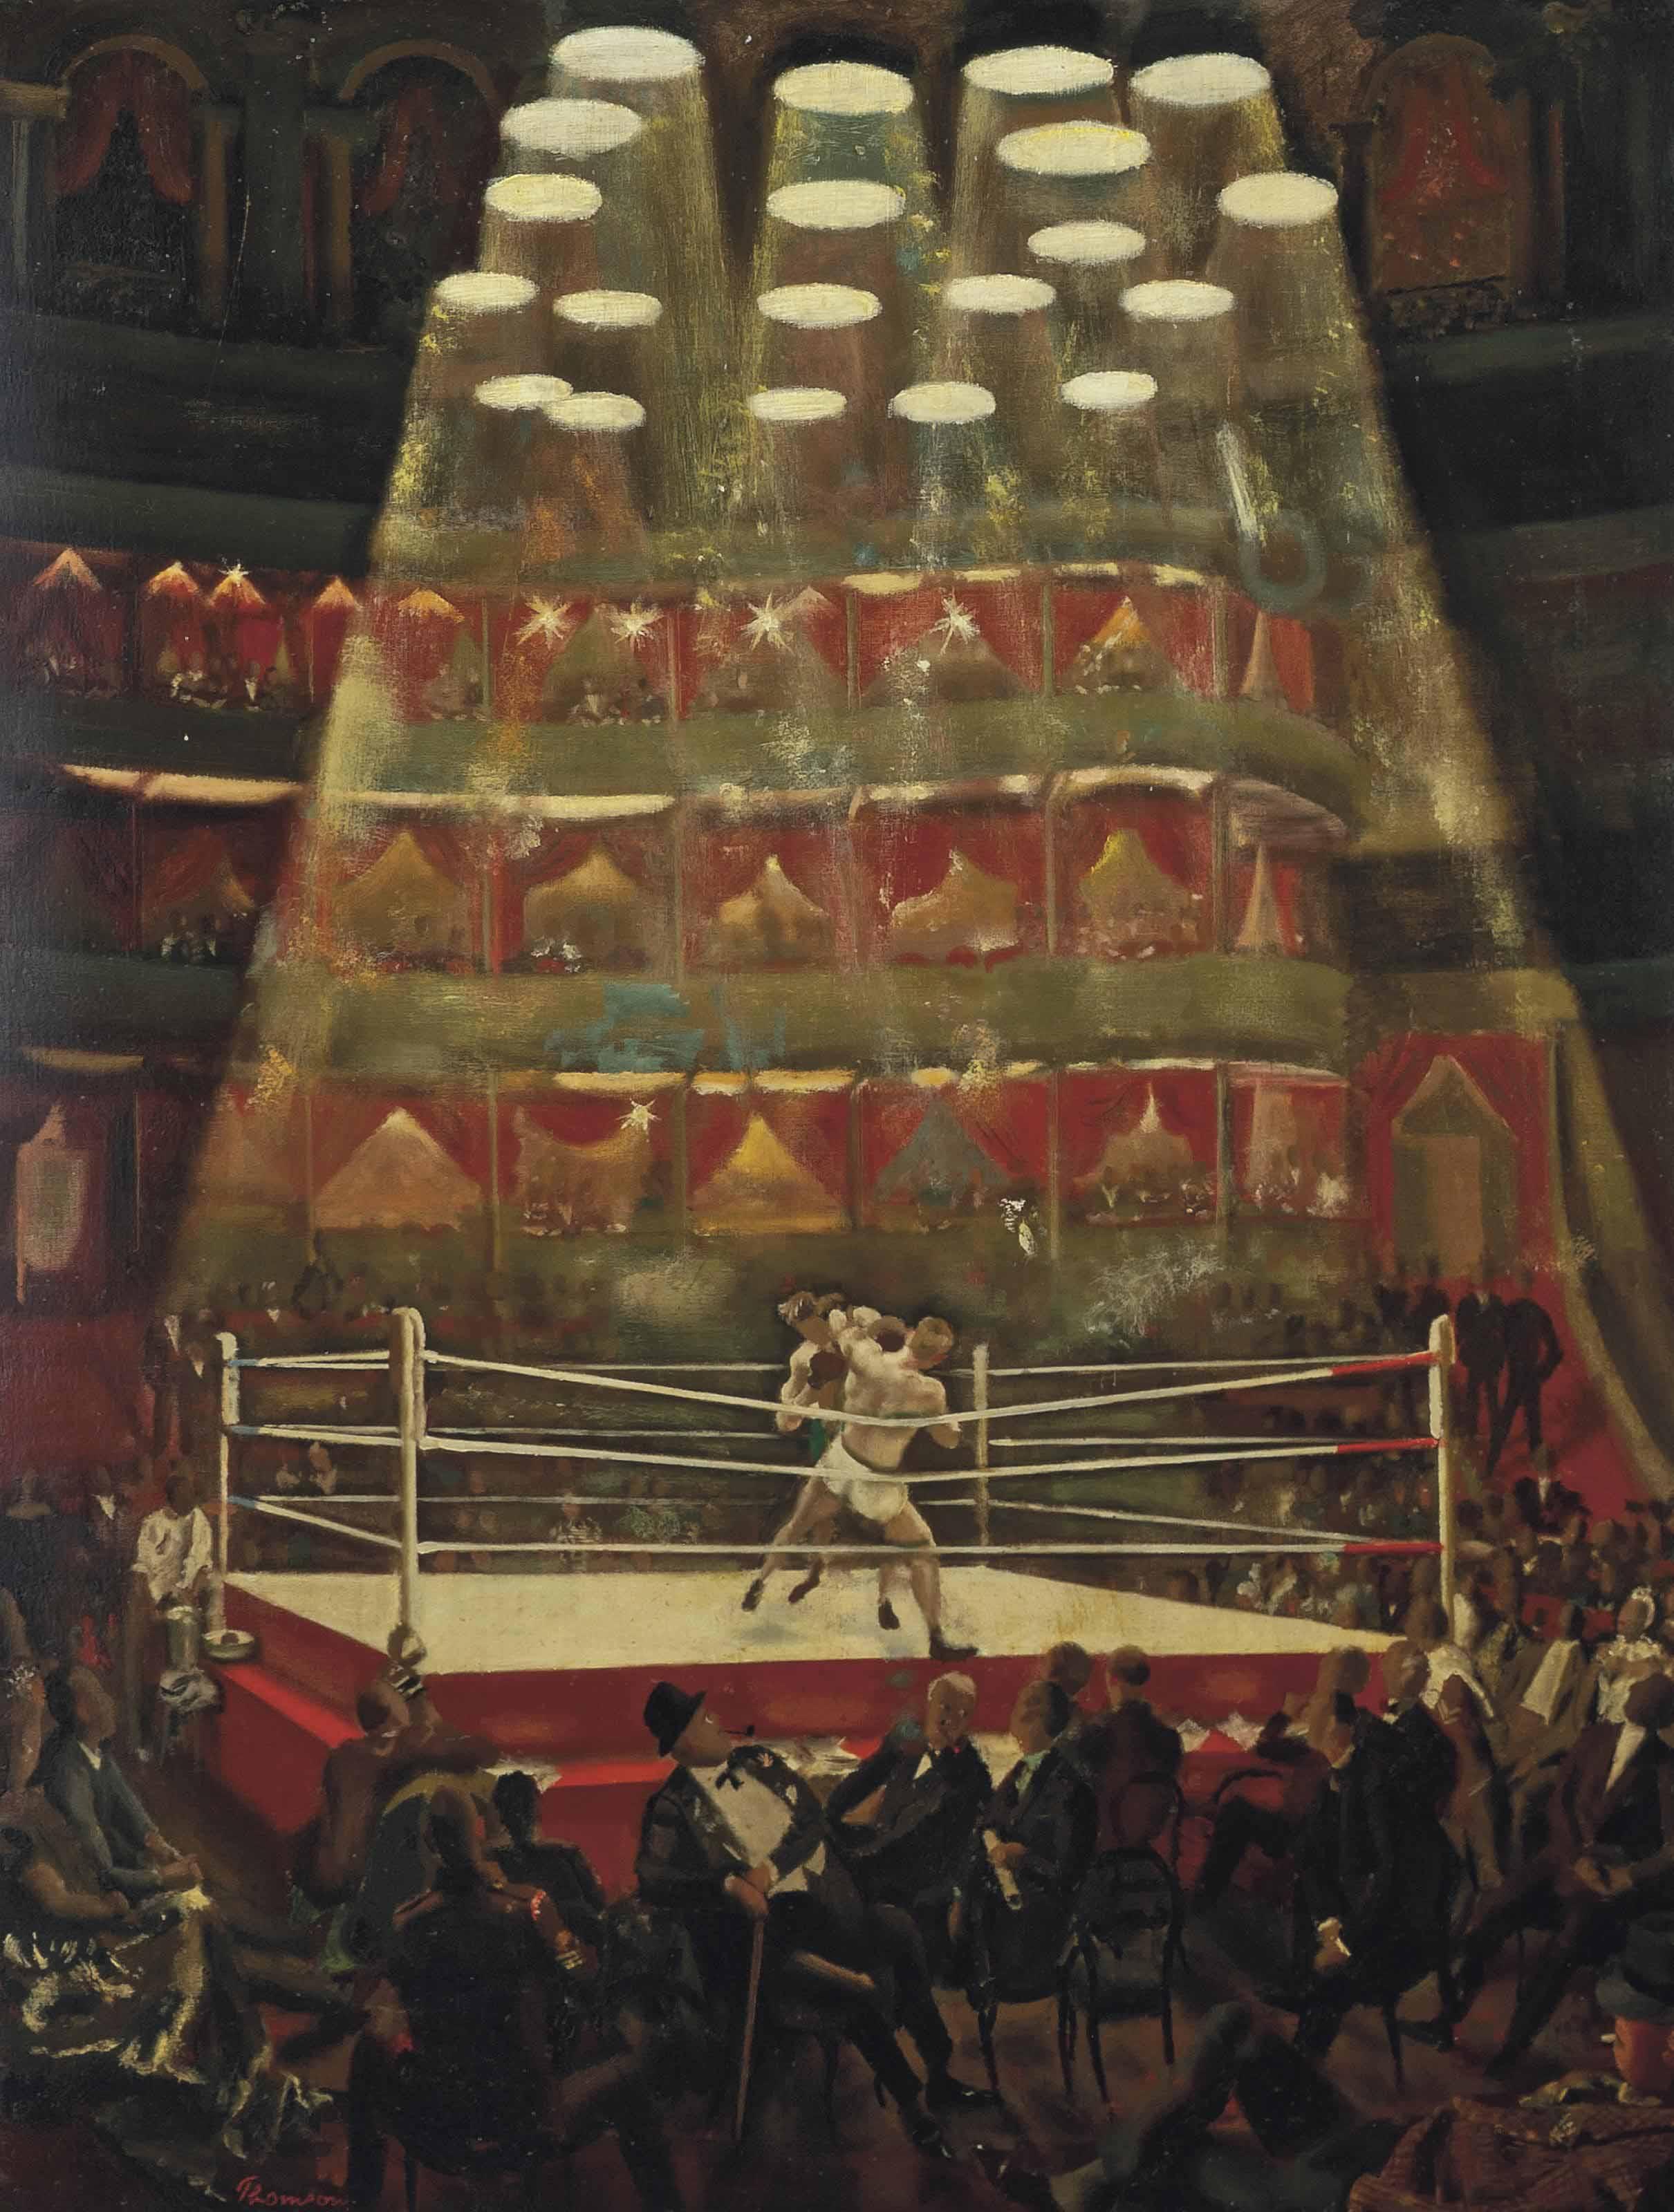 The London Amateur Boxing Championship held at the Royal Albert Hall, 1948